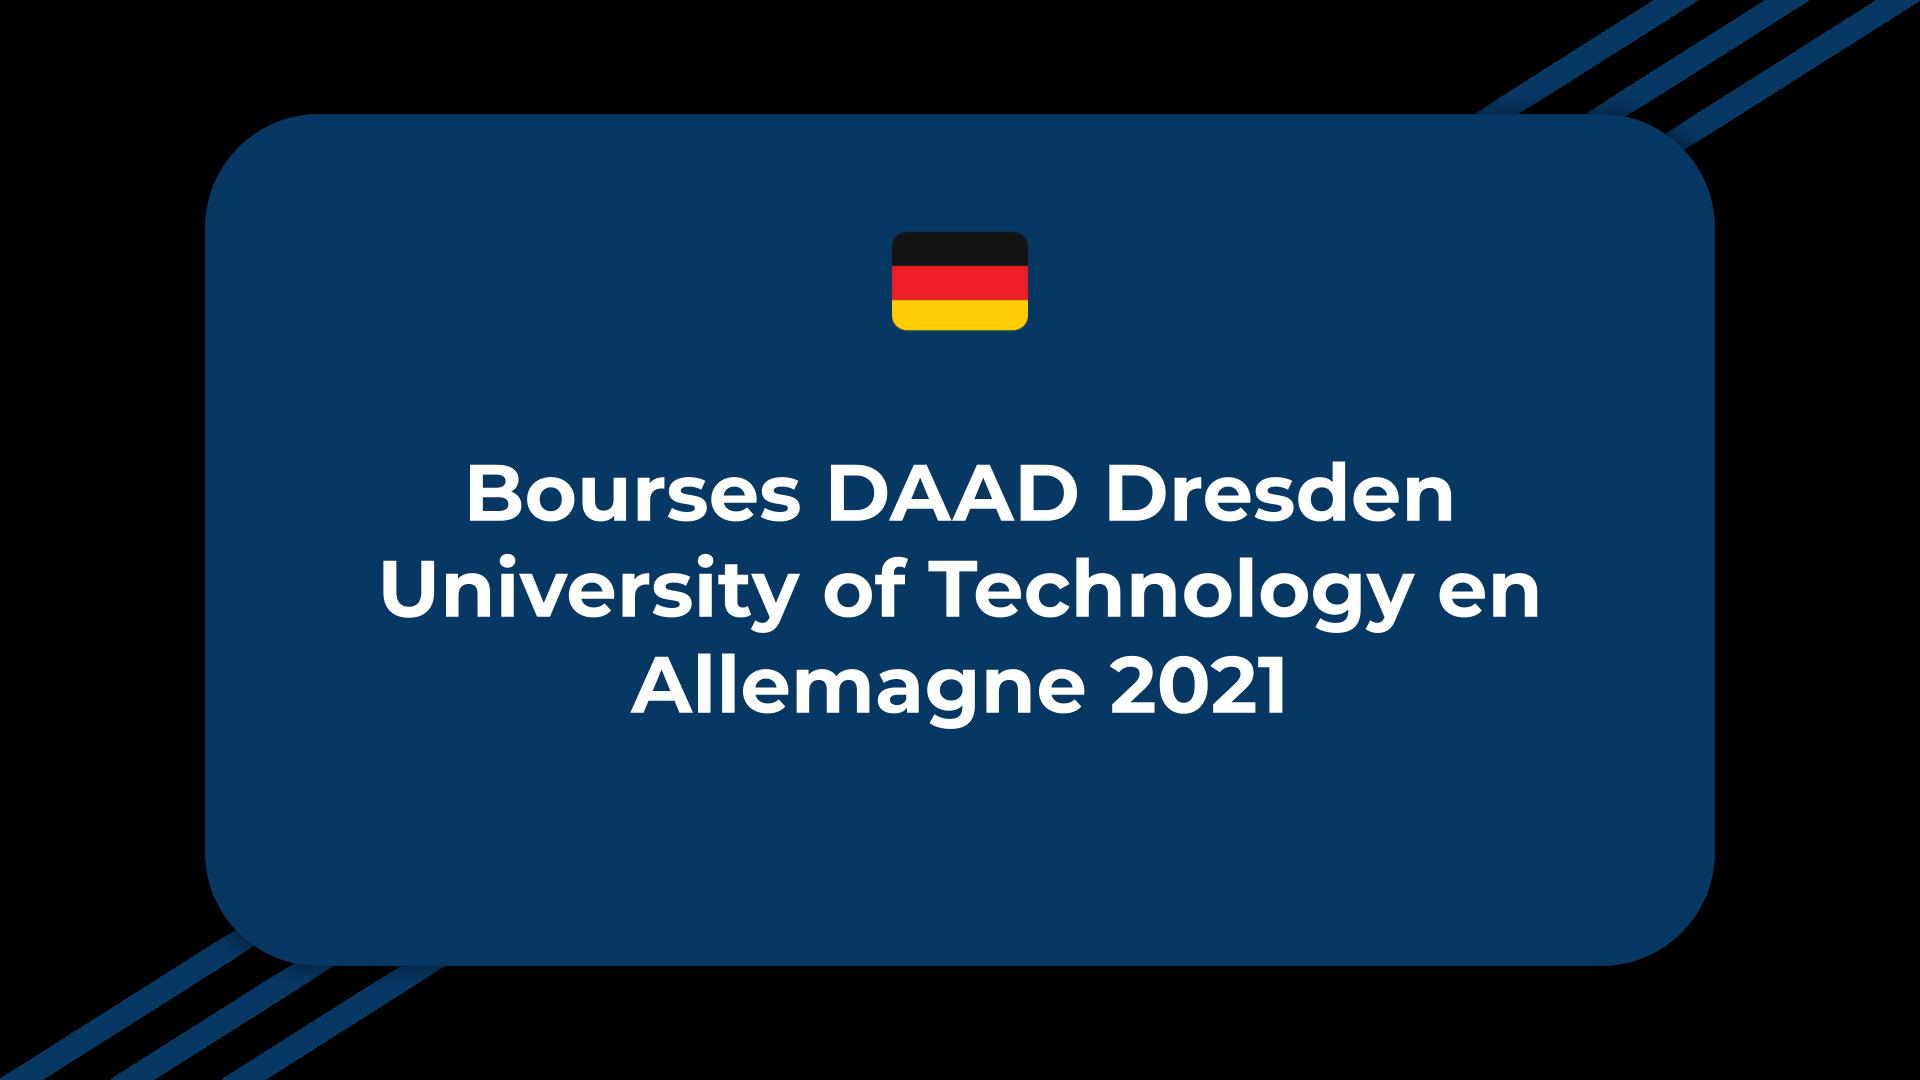 Bourses DAAD Dresden University of Technology